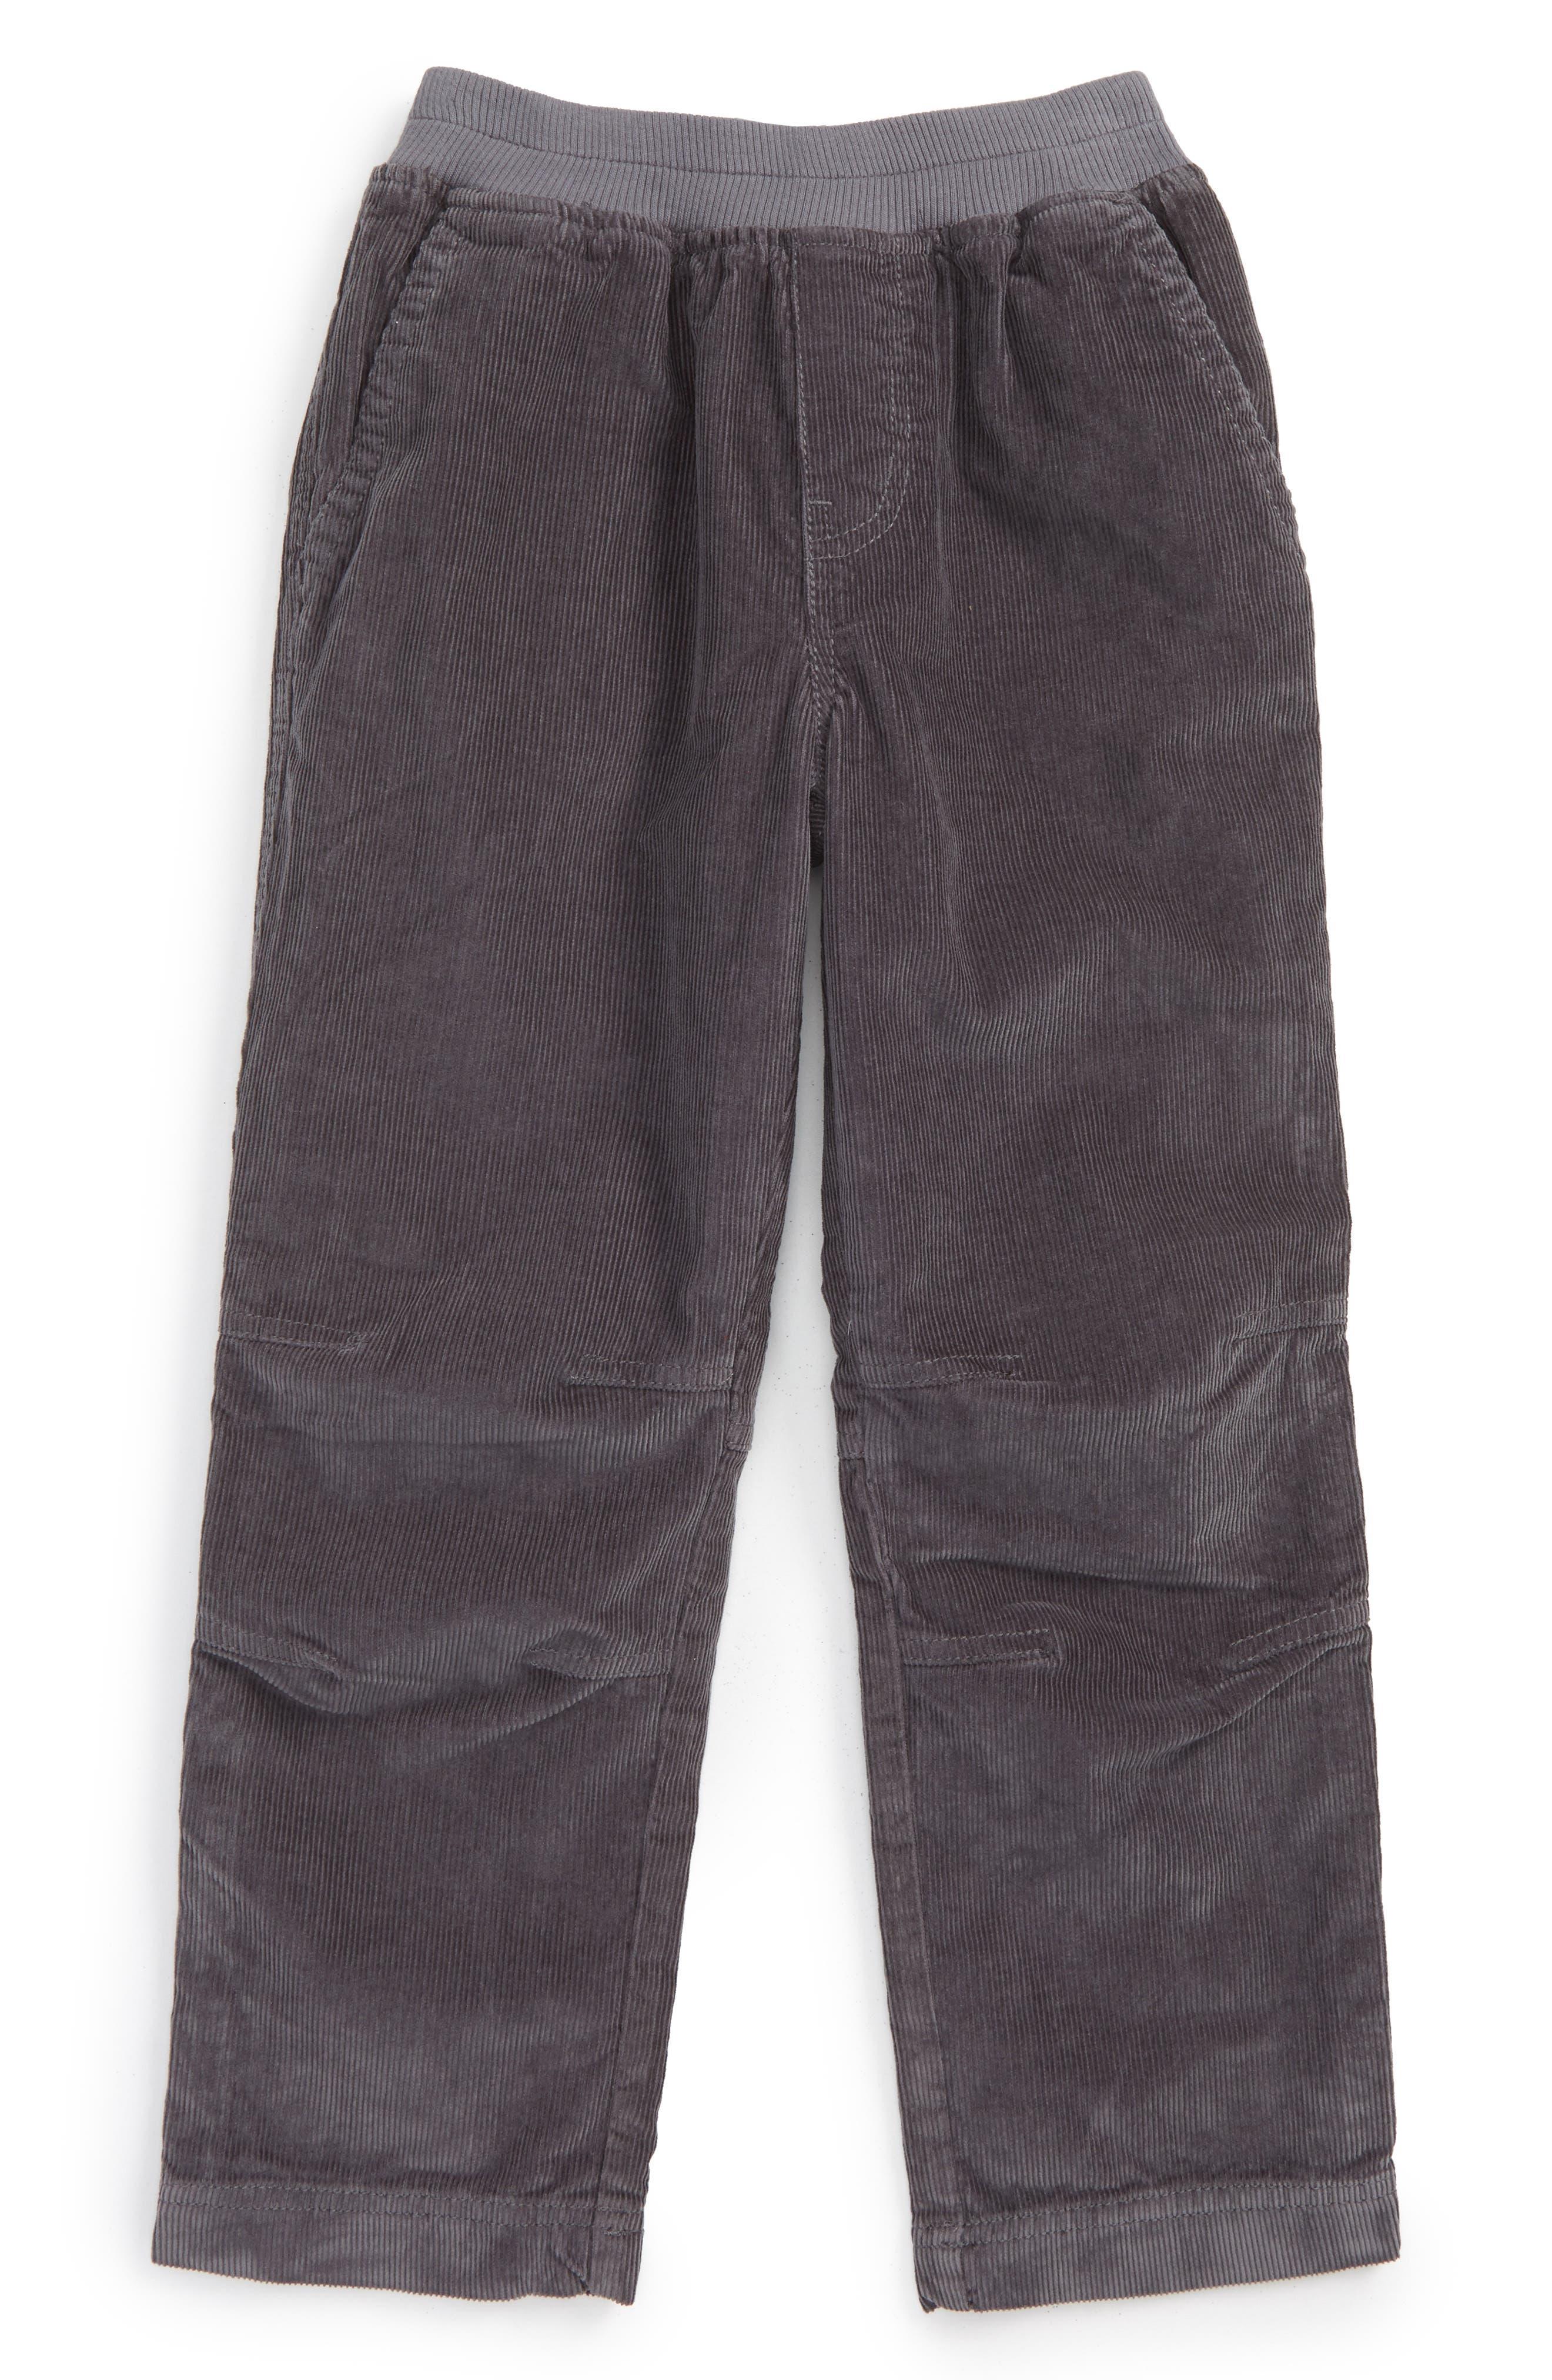 Main Image - Tea Collection Corduroy Pants (Toddler Boys & Little Boys)